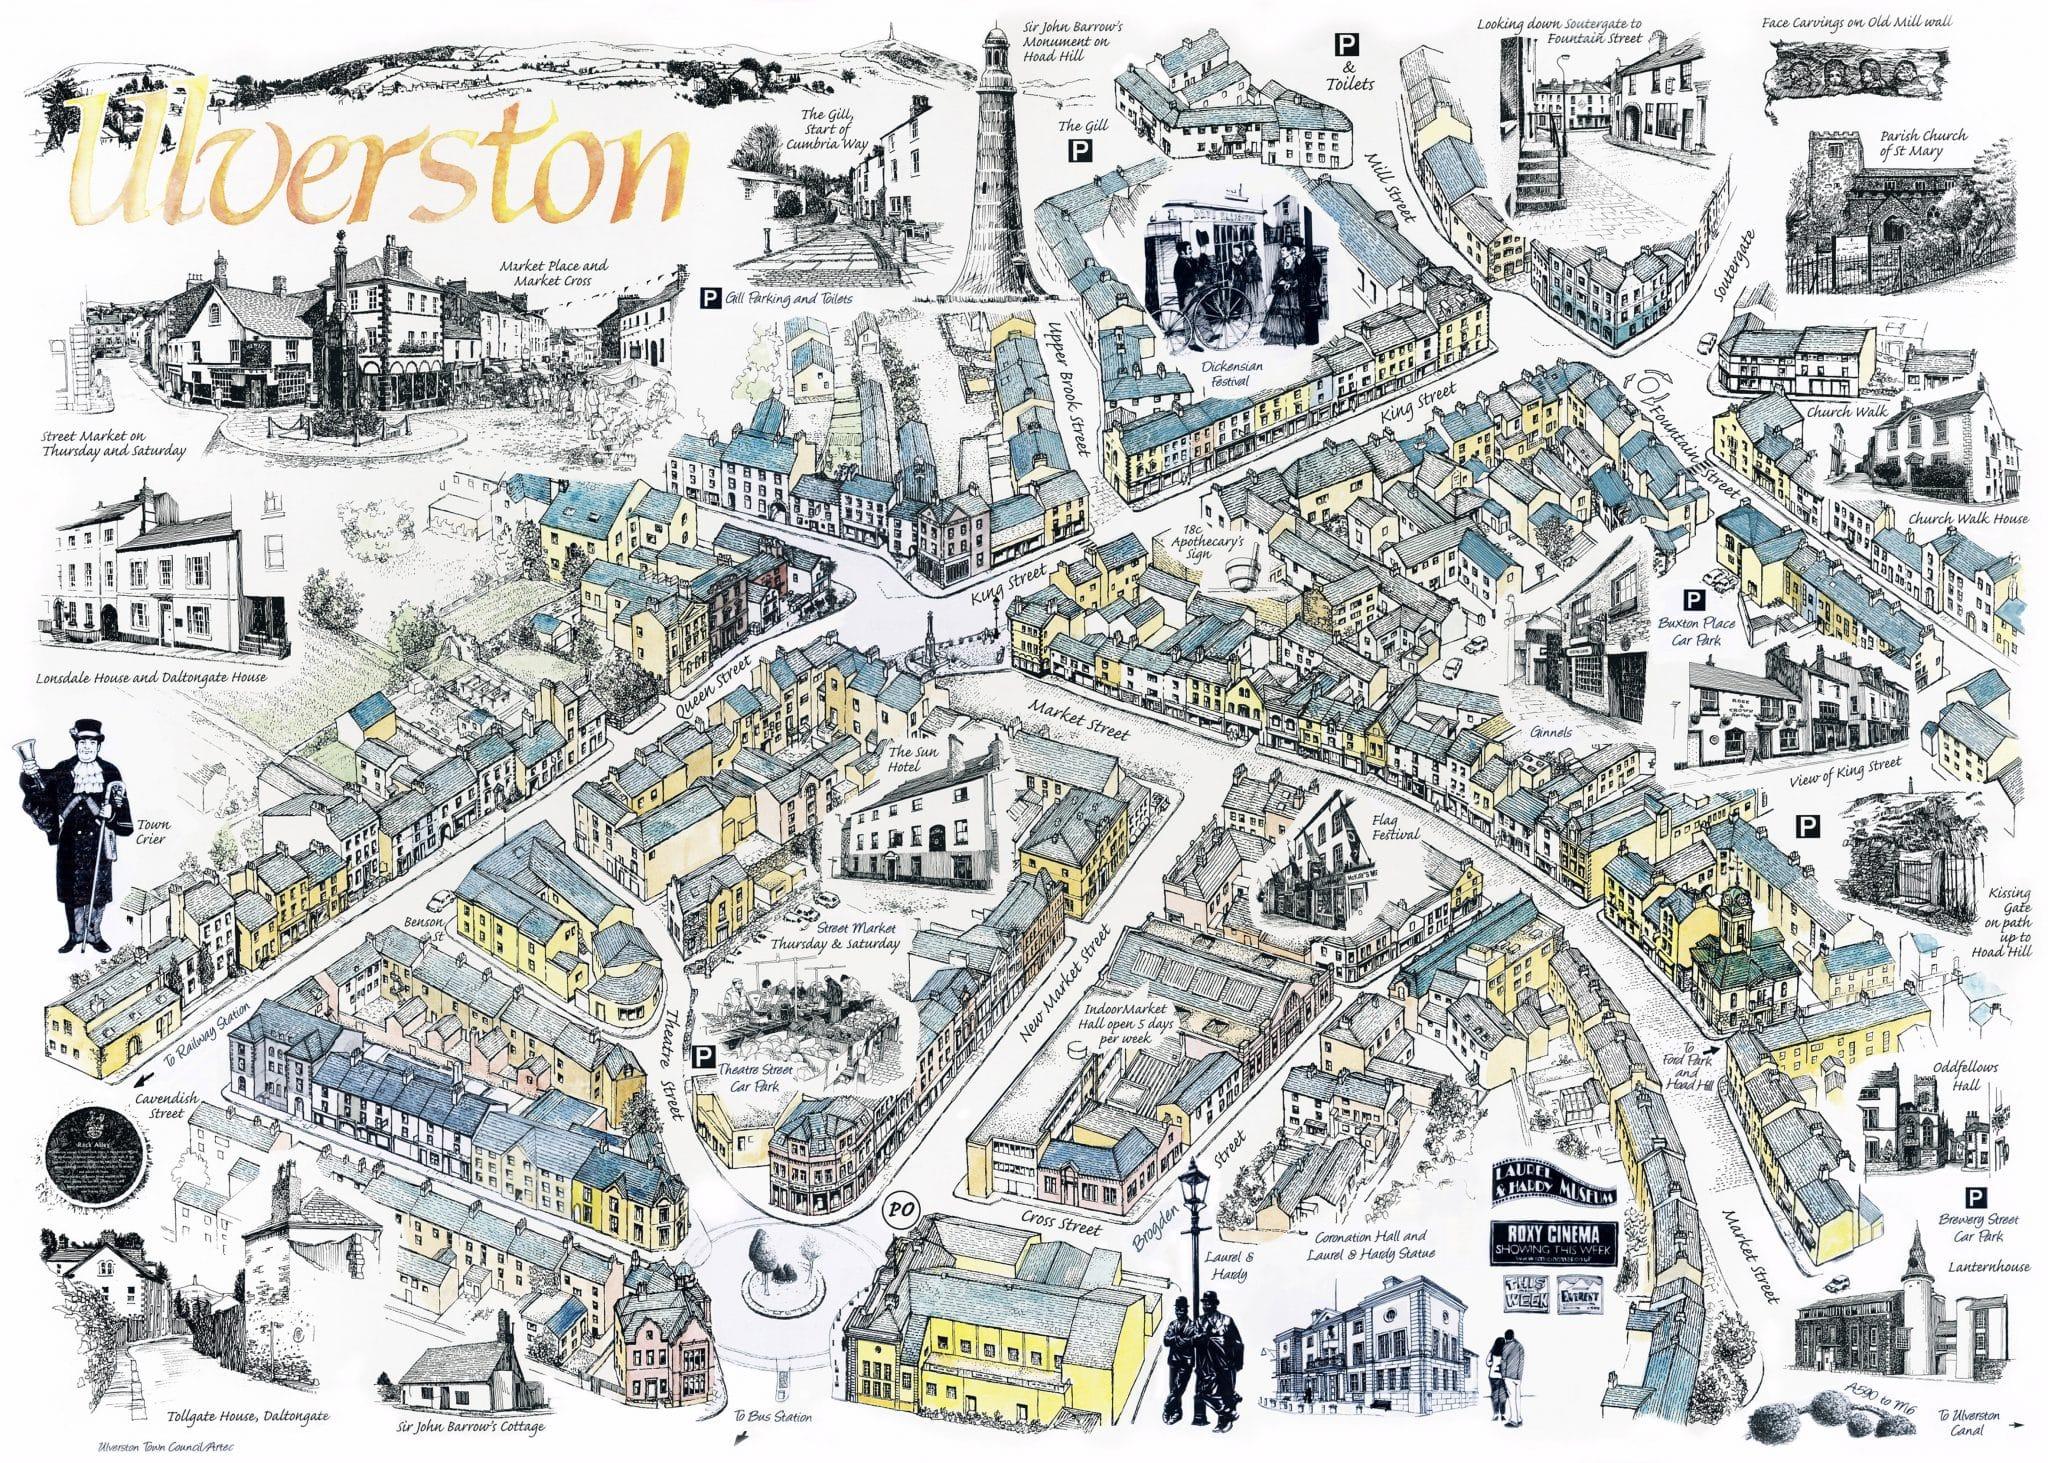 Ulverston illustrated map